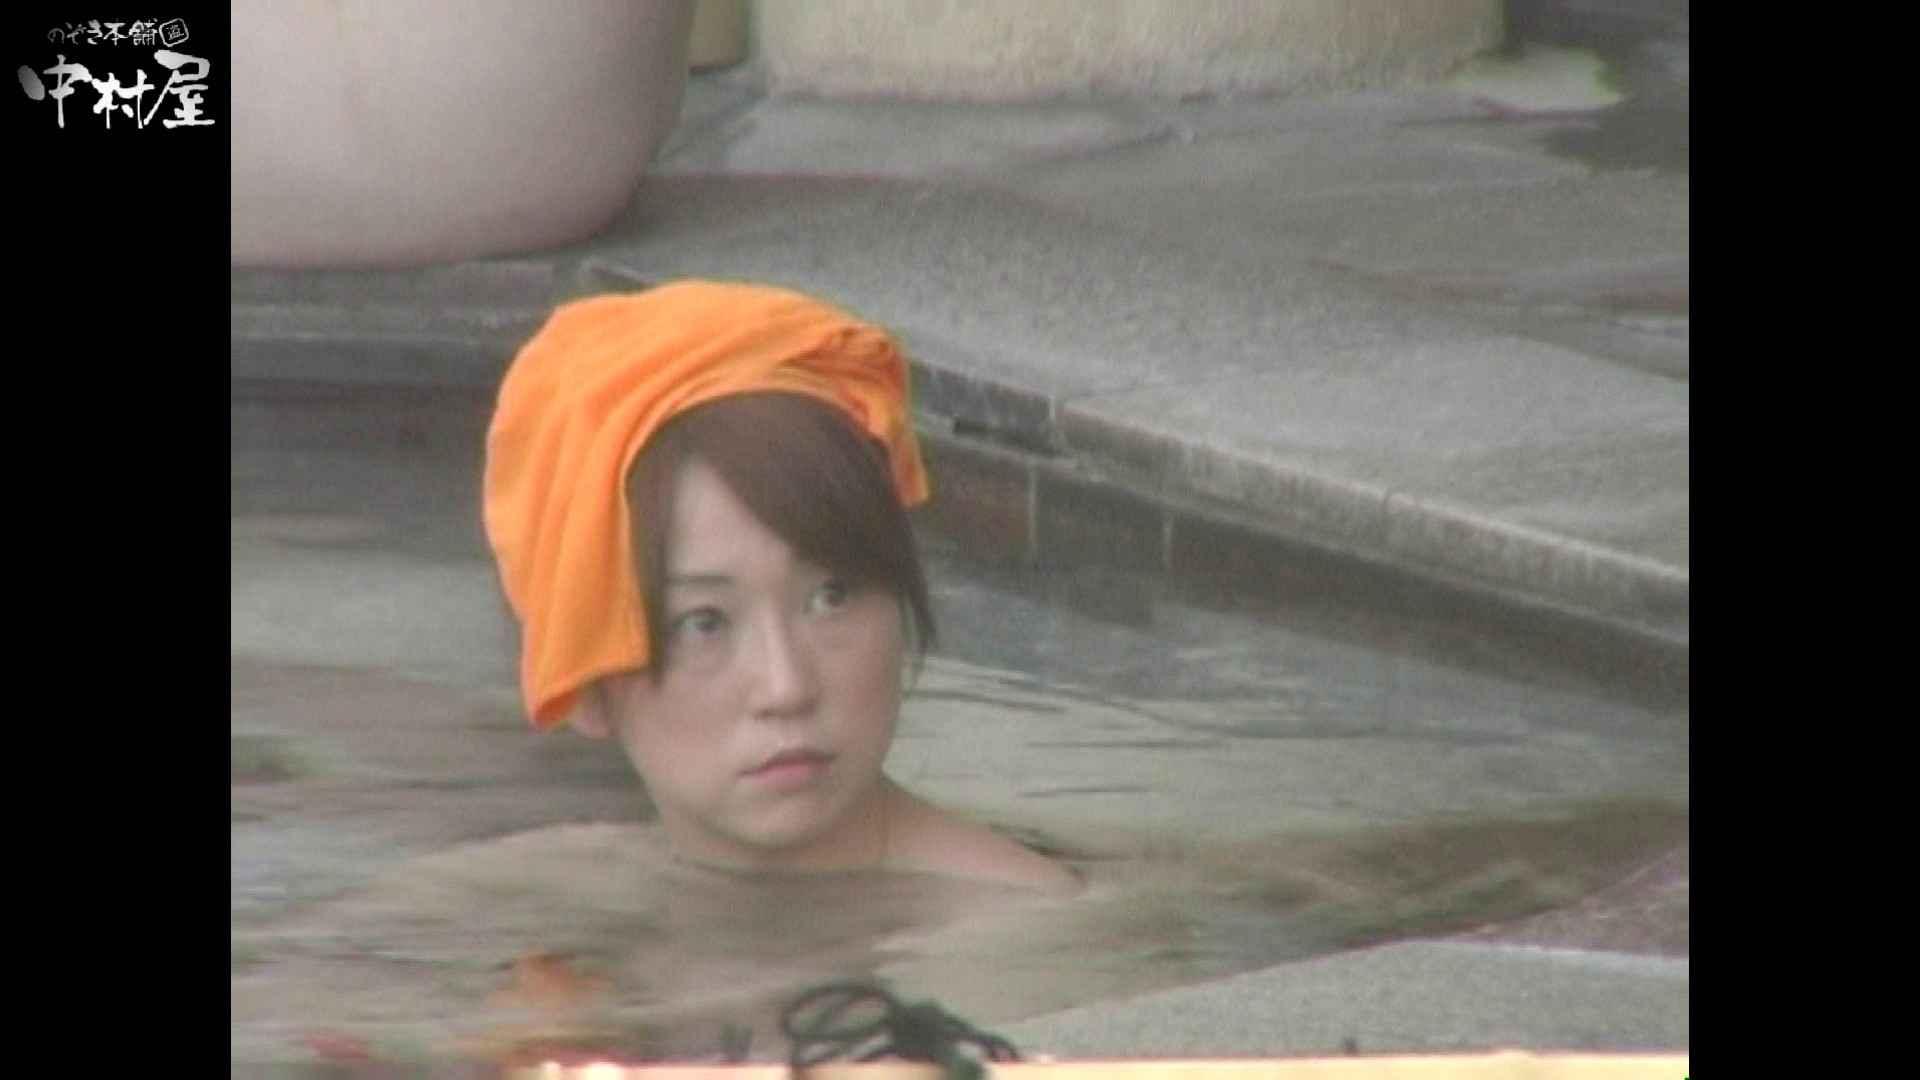 Aquaな露天風呂Vol.941 盗撮師作品  76pic 21